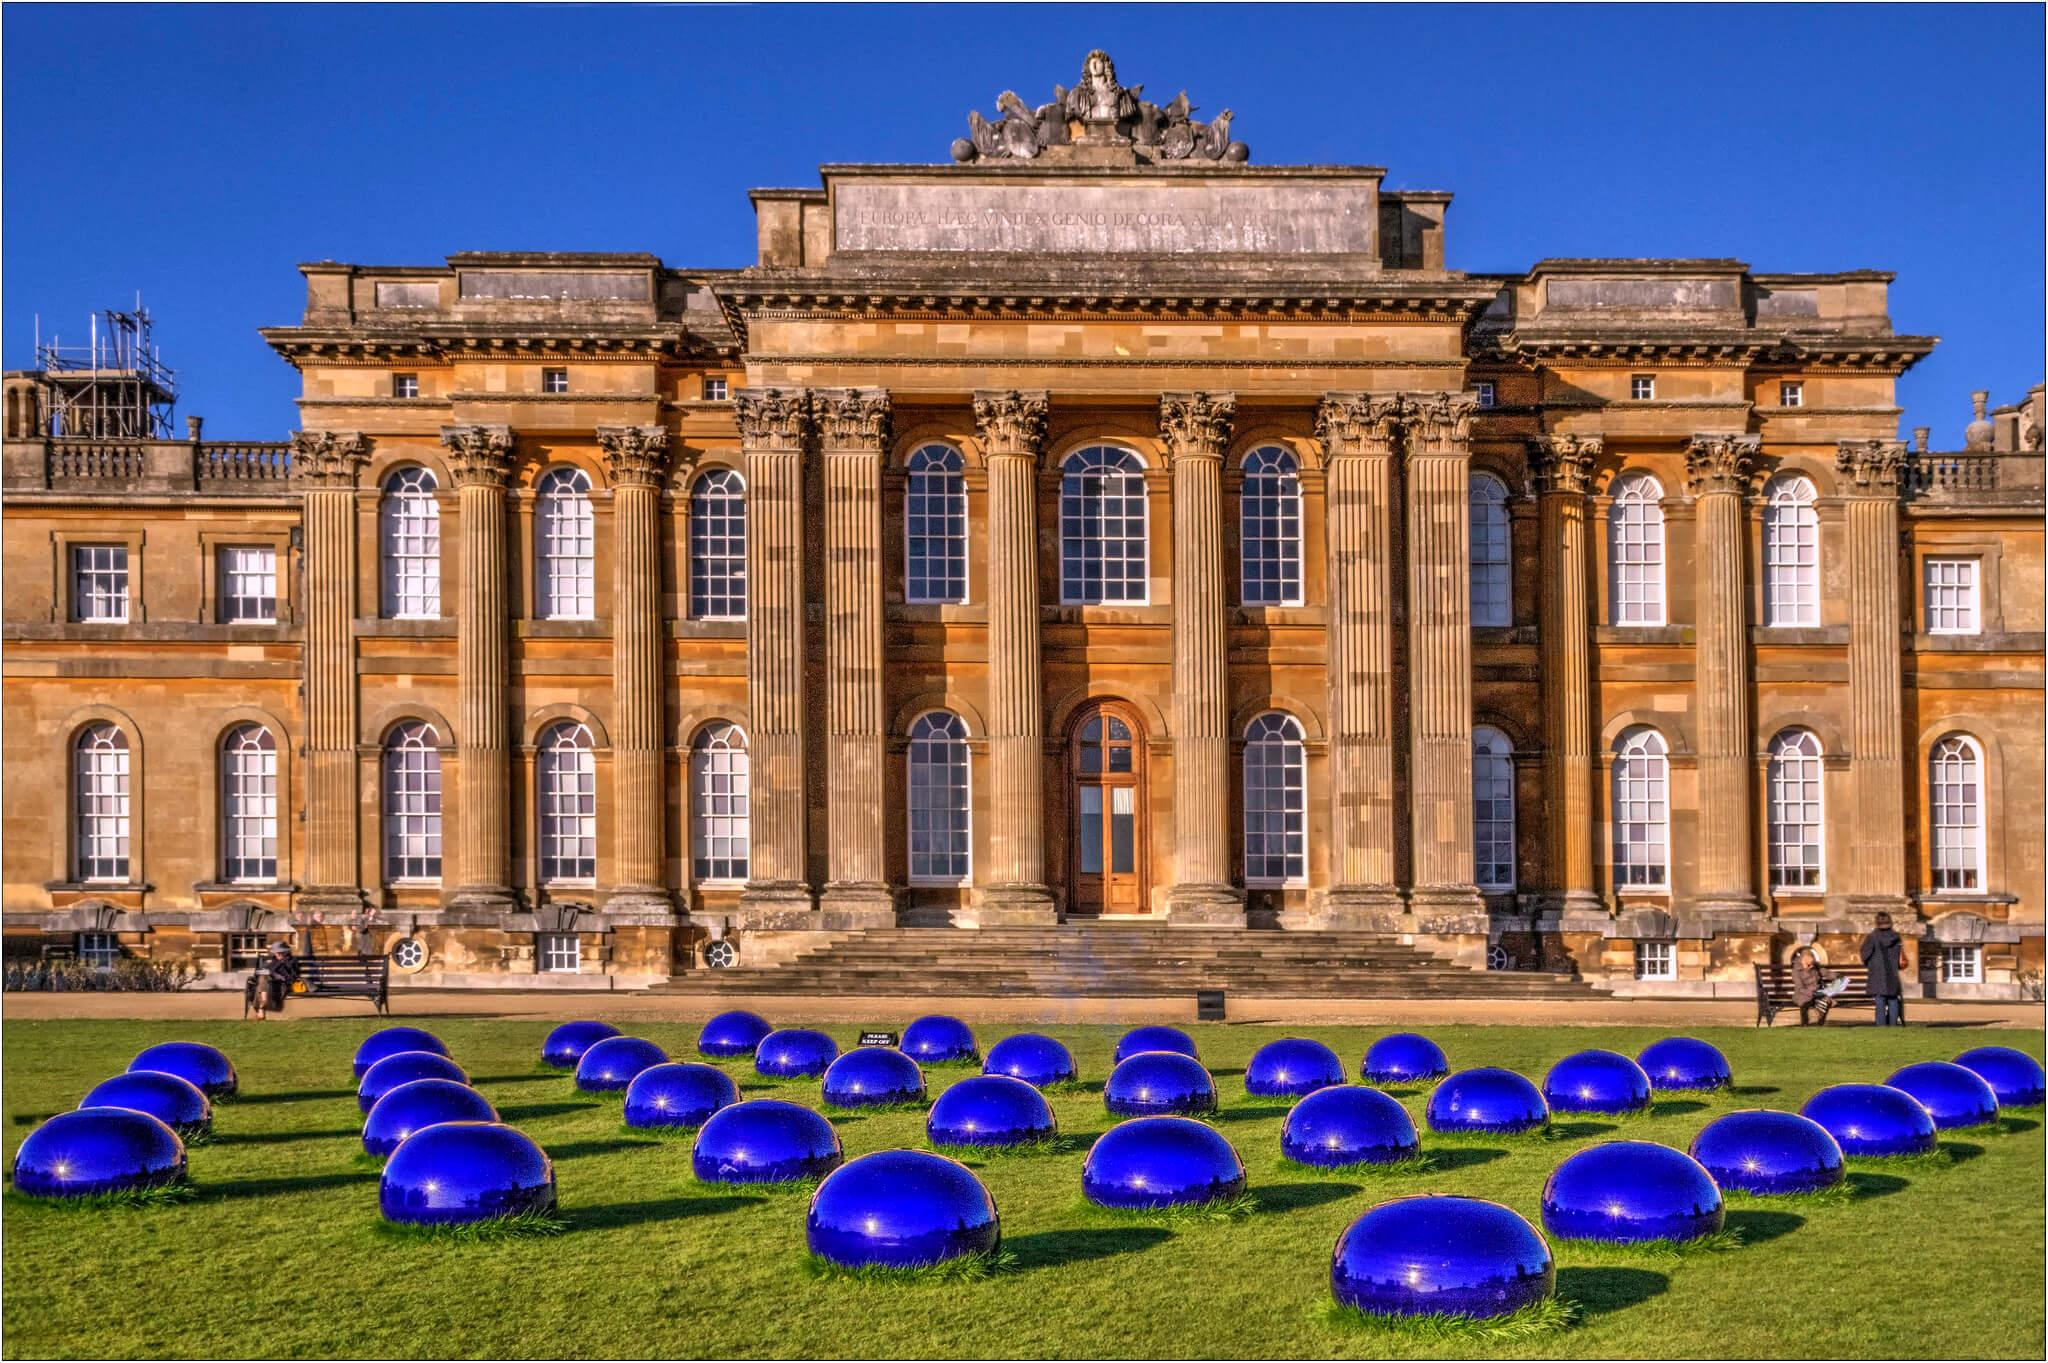 Blenheim Palace Ai Weiwei exhibition